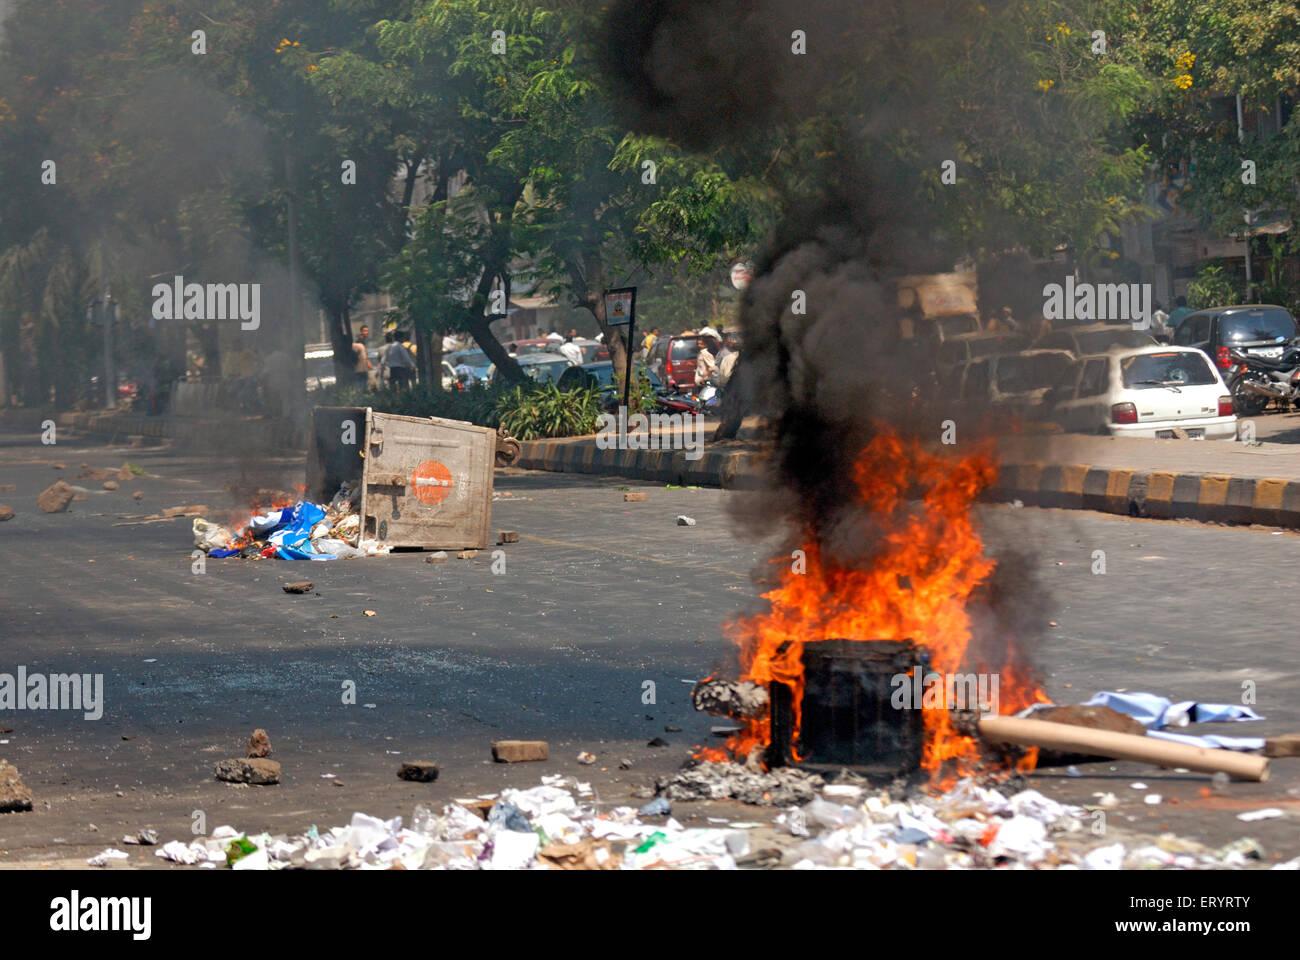 Protestation violente combustion des déchets sur road Bandra;;;; Bombay Mumbai Maharashtra Photo Stock